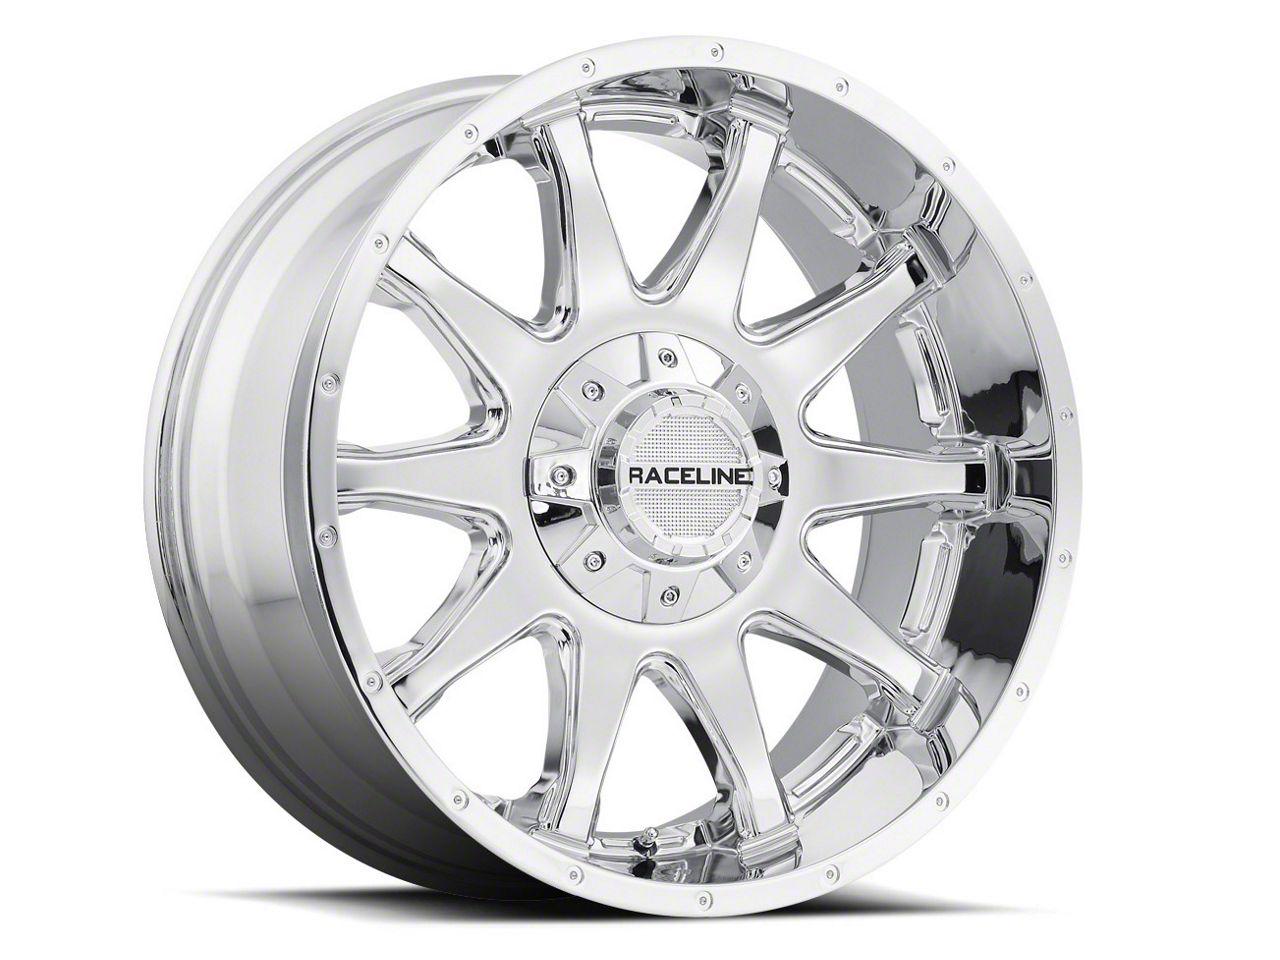 raceline sierra shift chrome 6 lug wheel 20x12 930c 21266 44 07  raceline shift chrome 6 lug wheel 20x12 07 19 sierra 1500